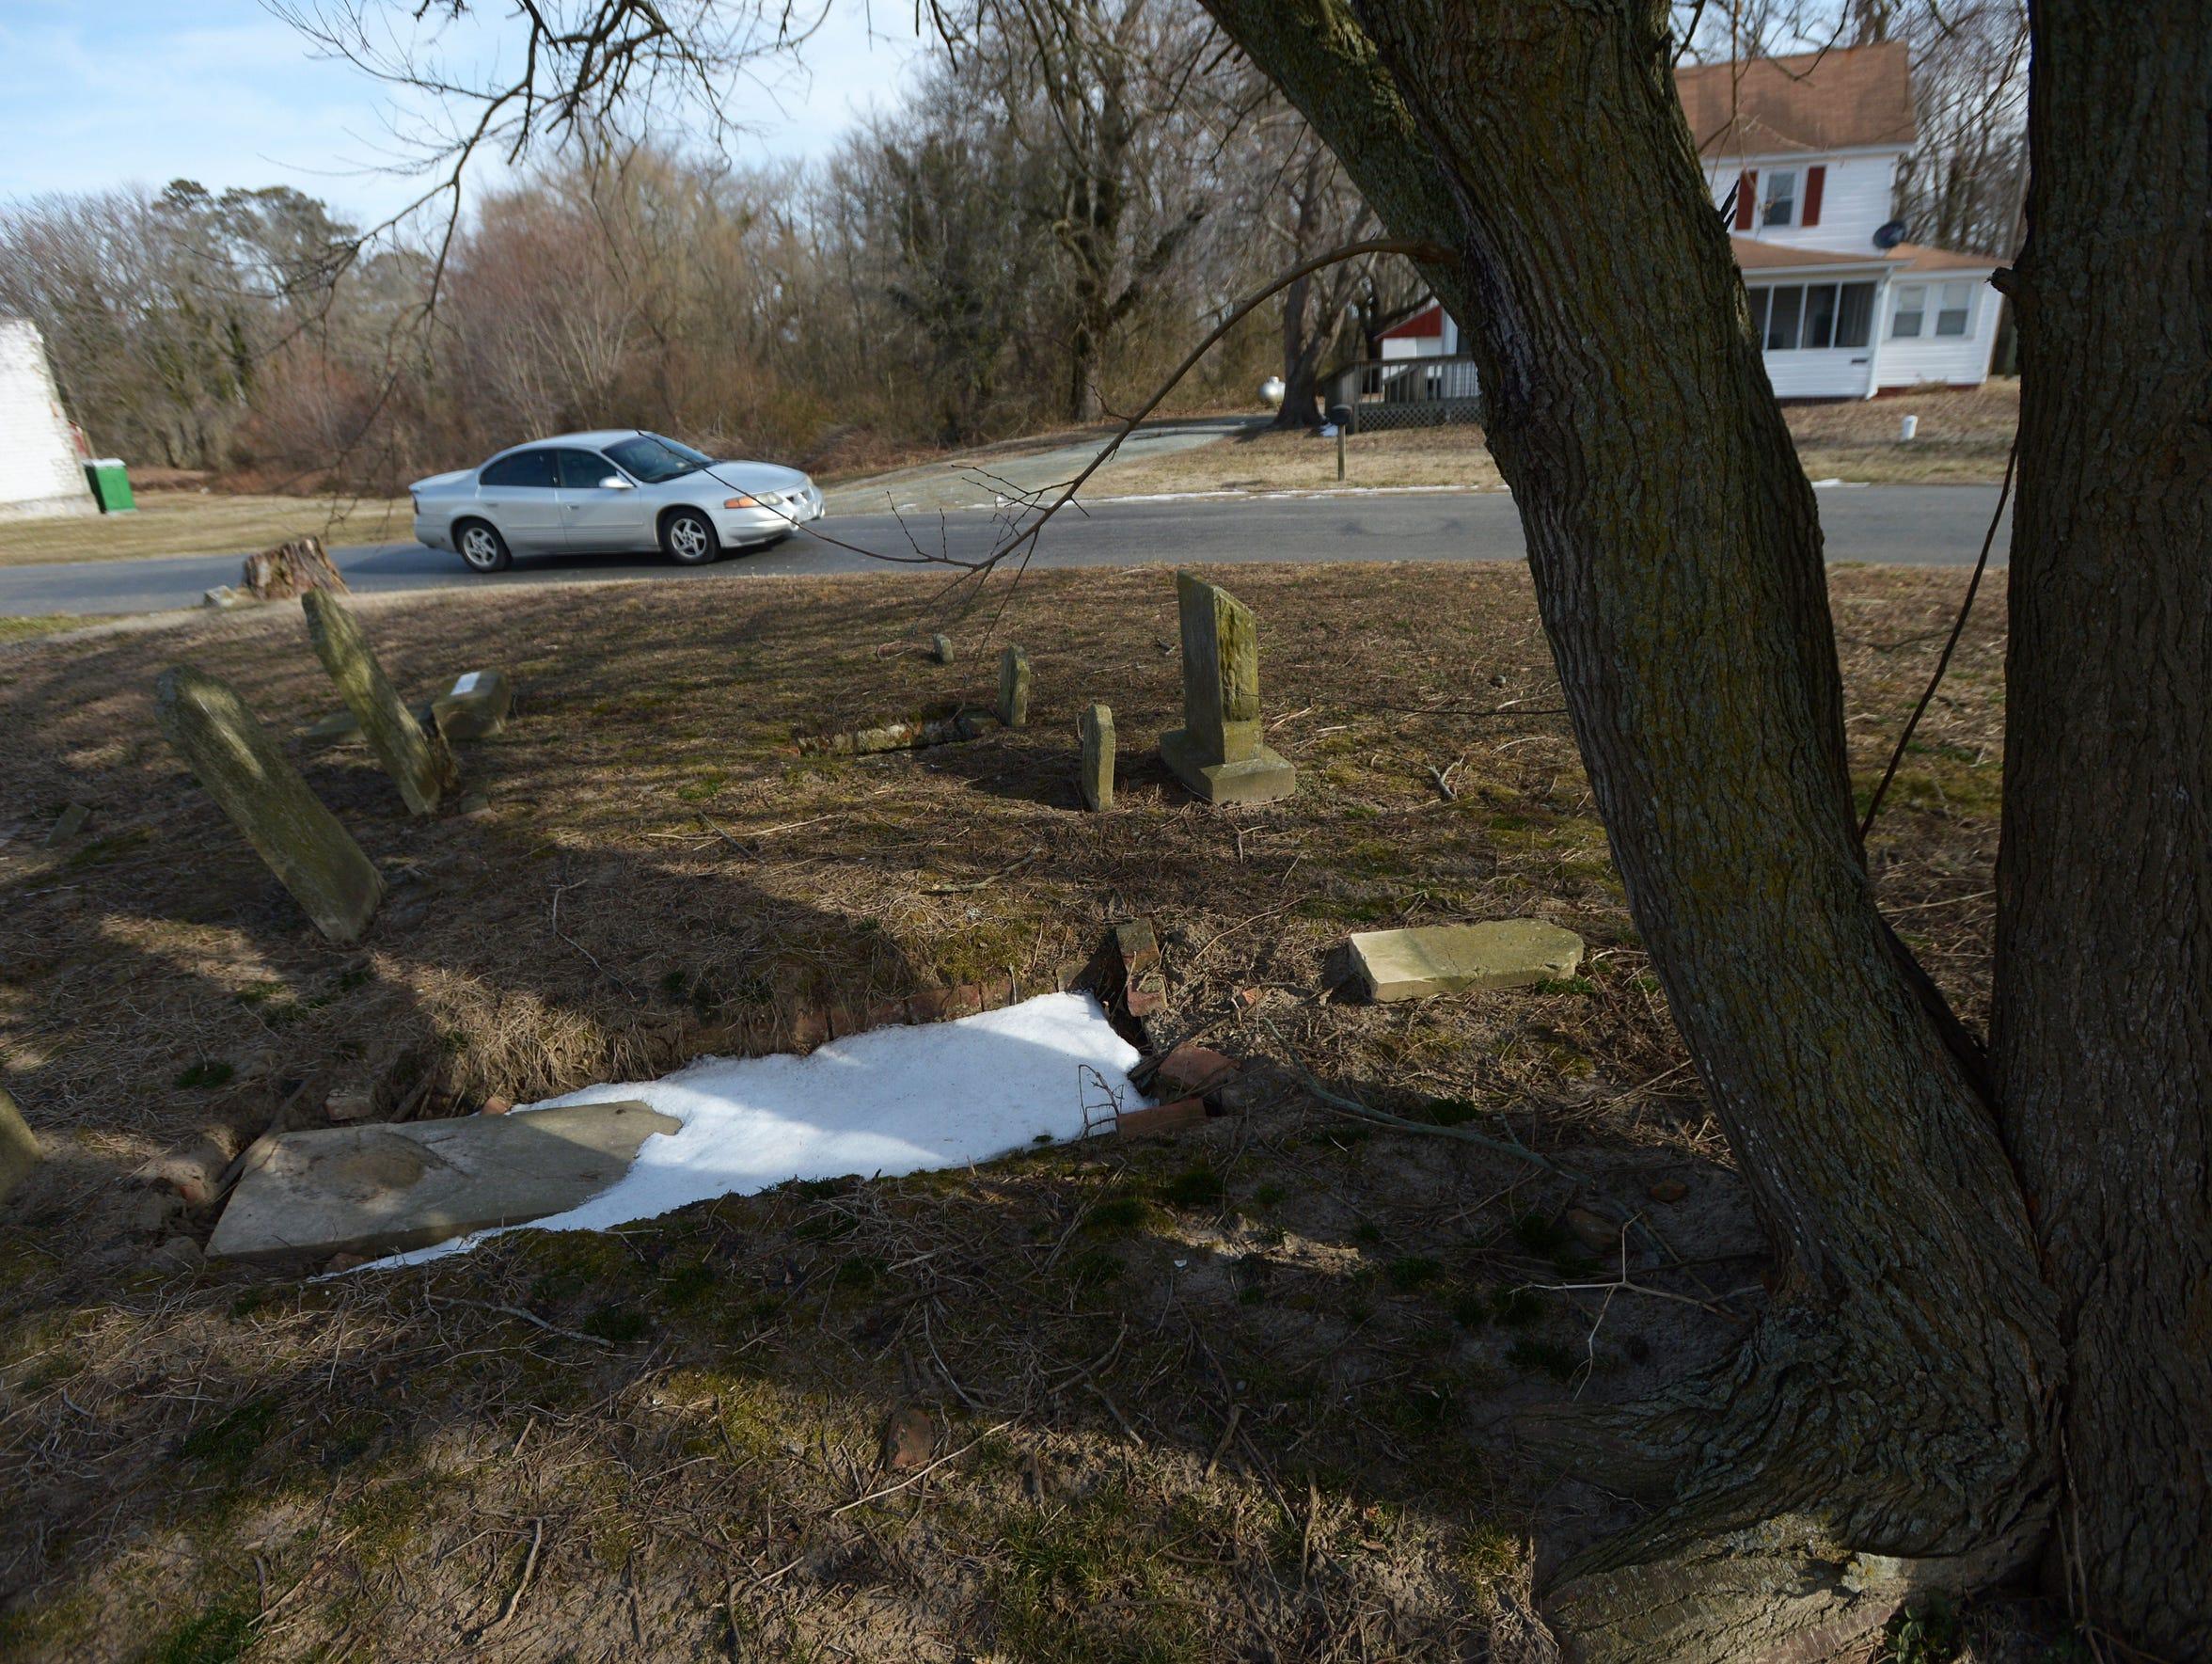 A car passes the small Mason family cemetery plot on